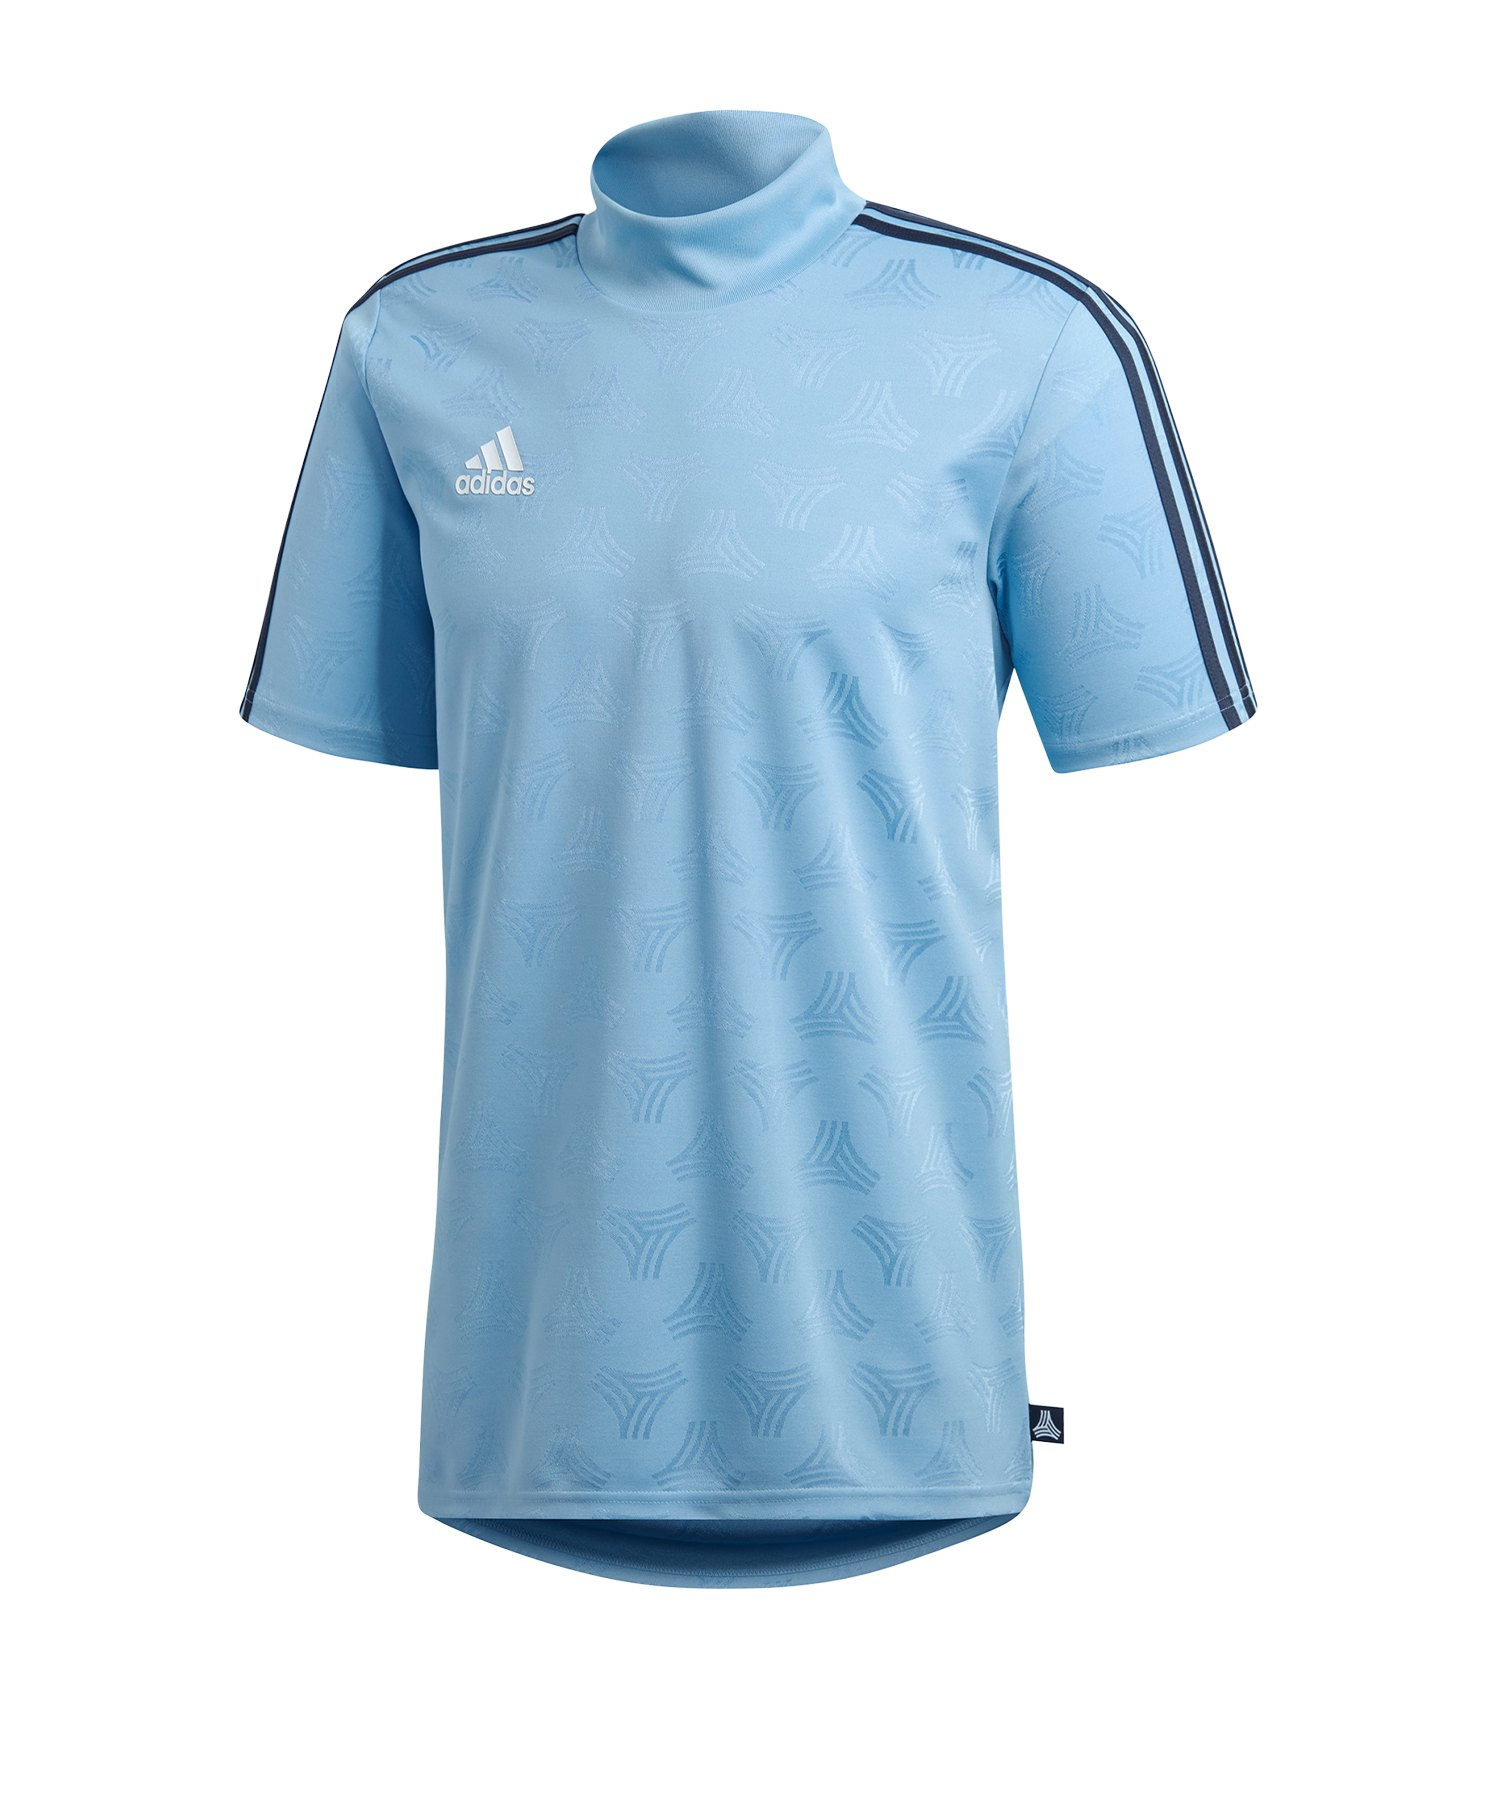 adidas Tango JQ Tee T-Shirt Blau - blau